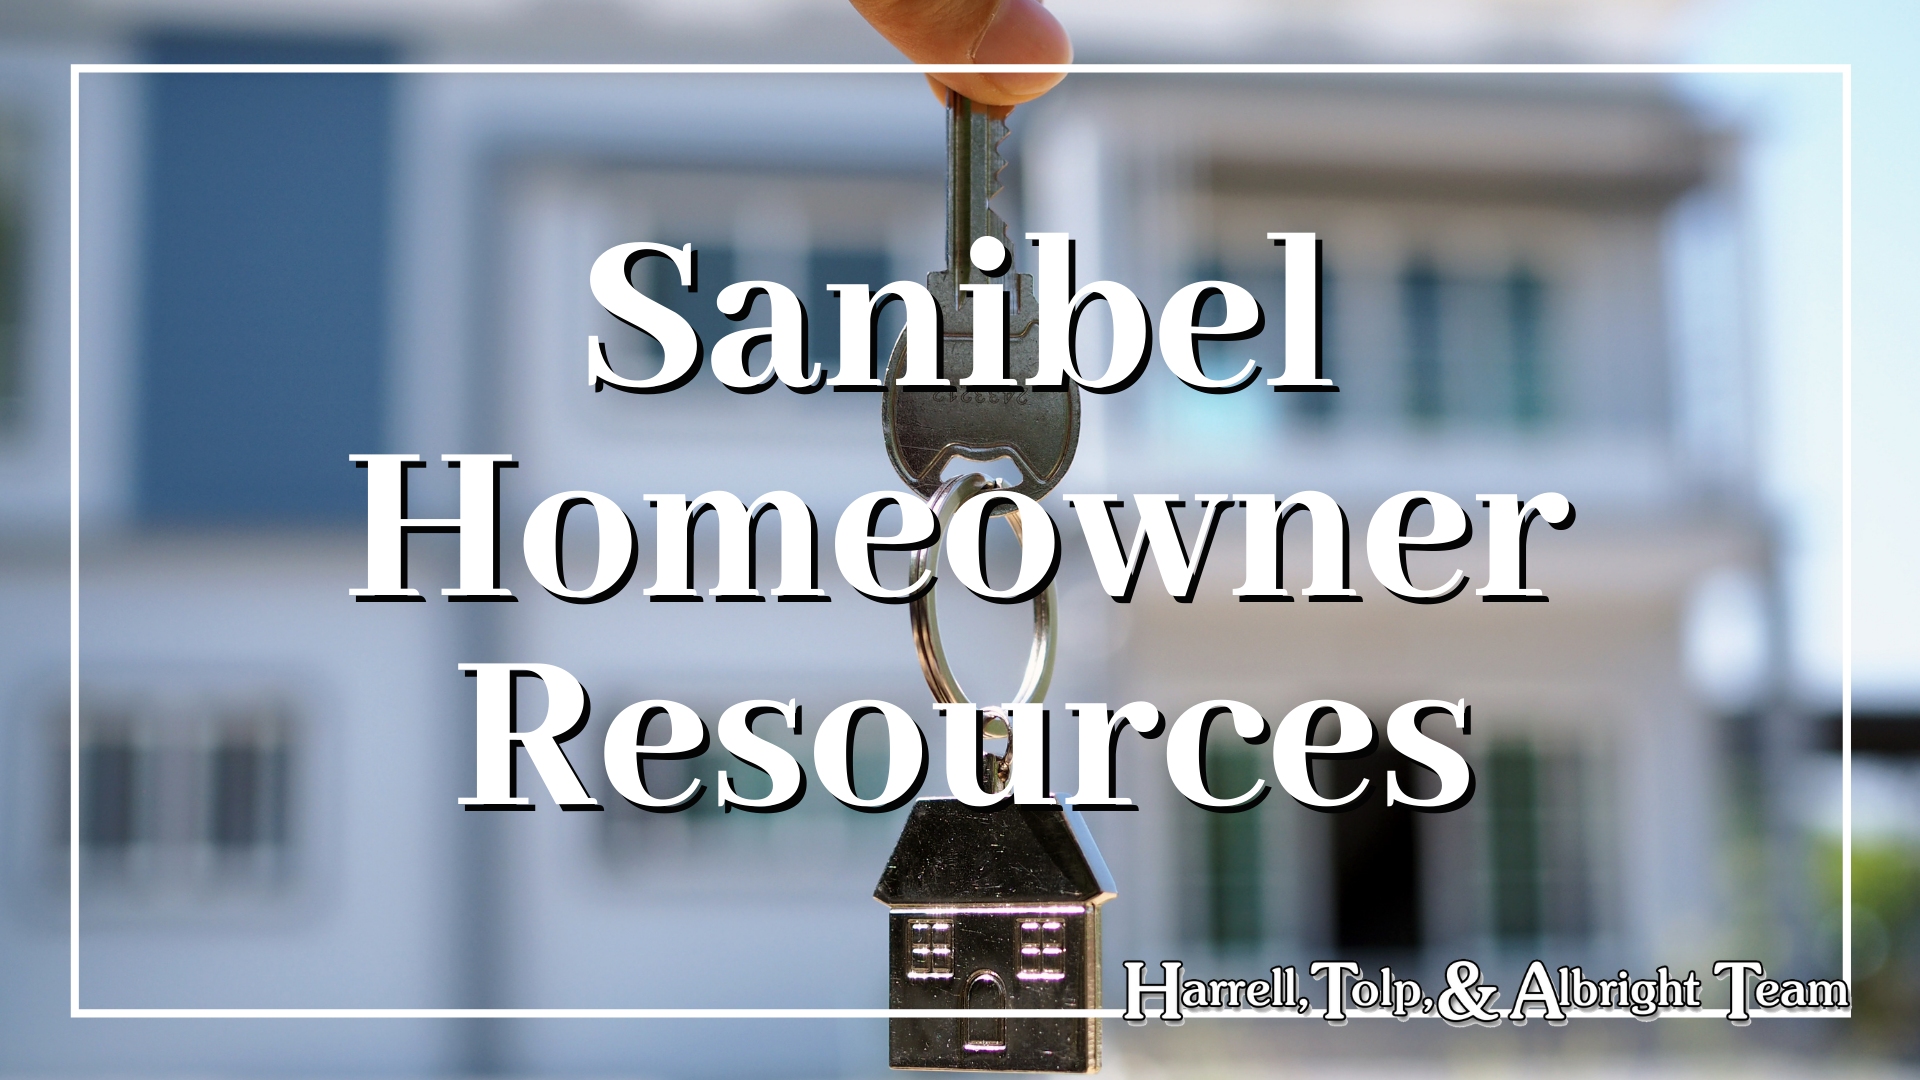 Sanibel Homeowner Resources